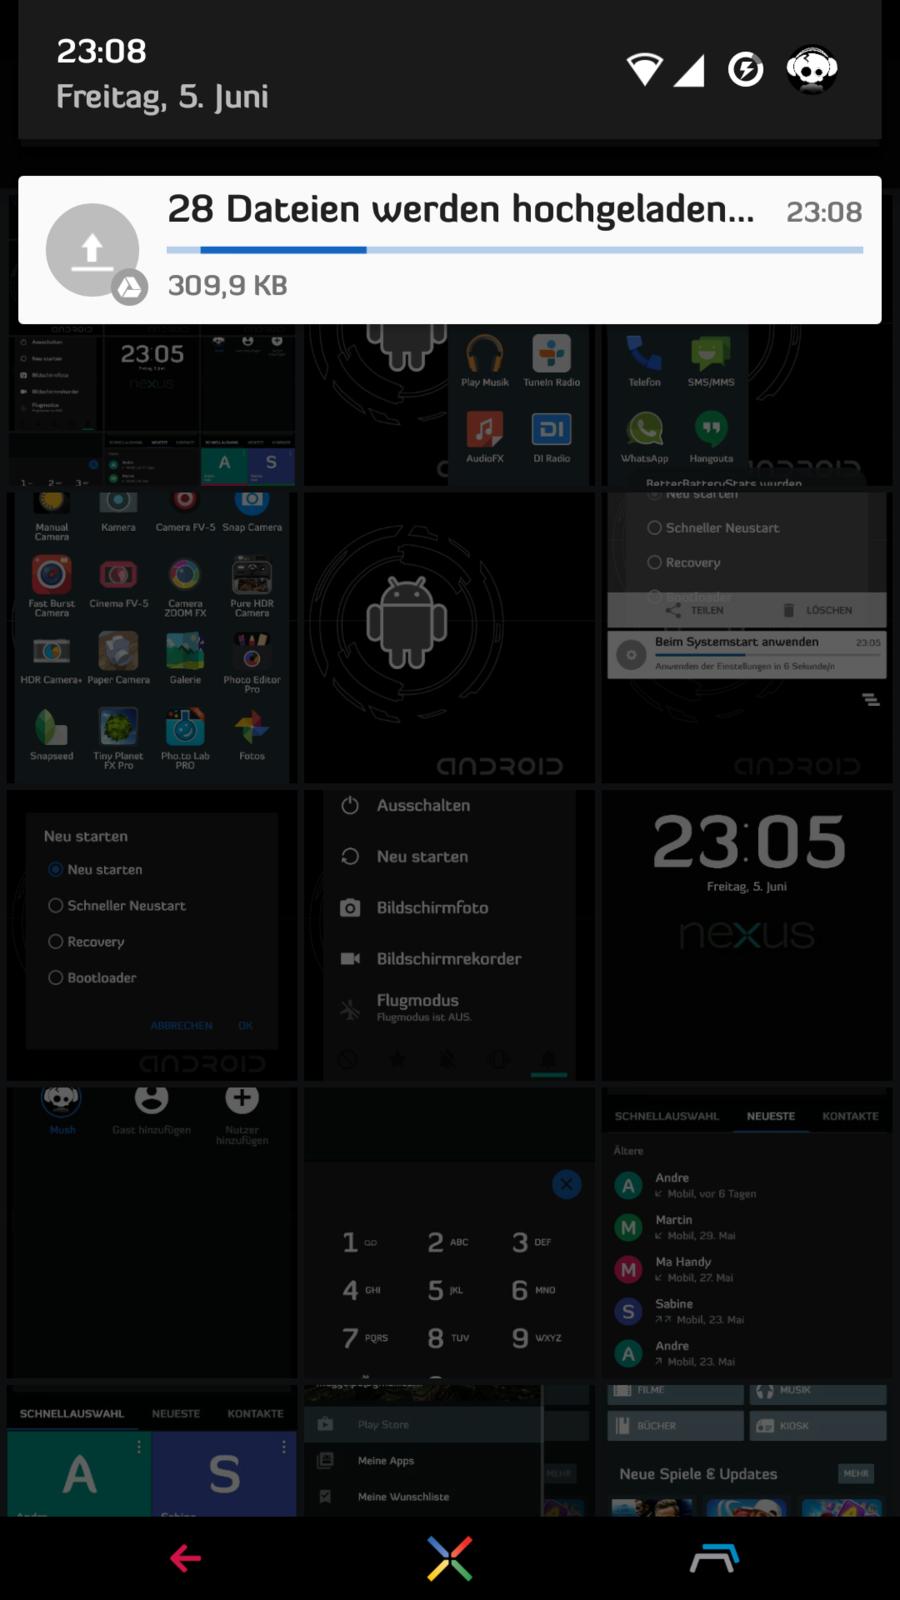 Screenshot_2015-06-05-23-08-53.png